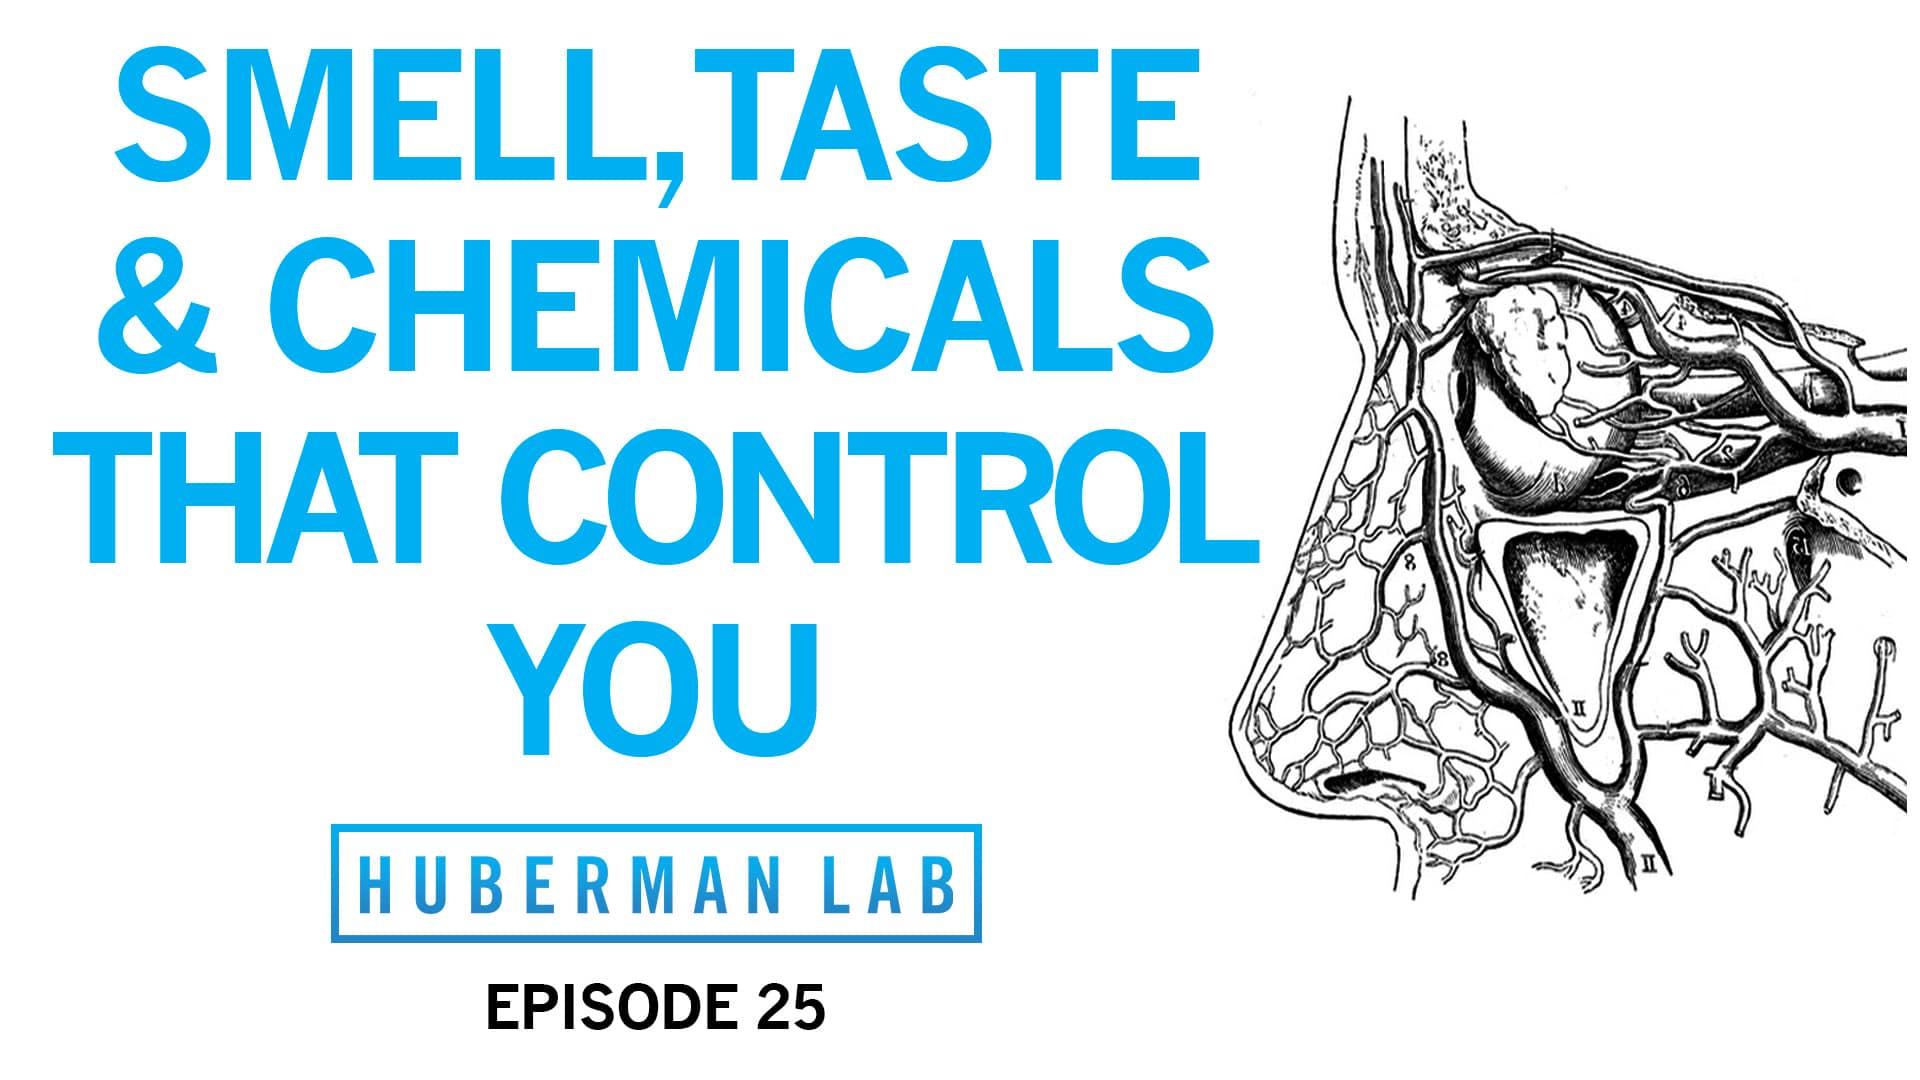 Huberman Lab Podcast Episode 25 Title Card